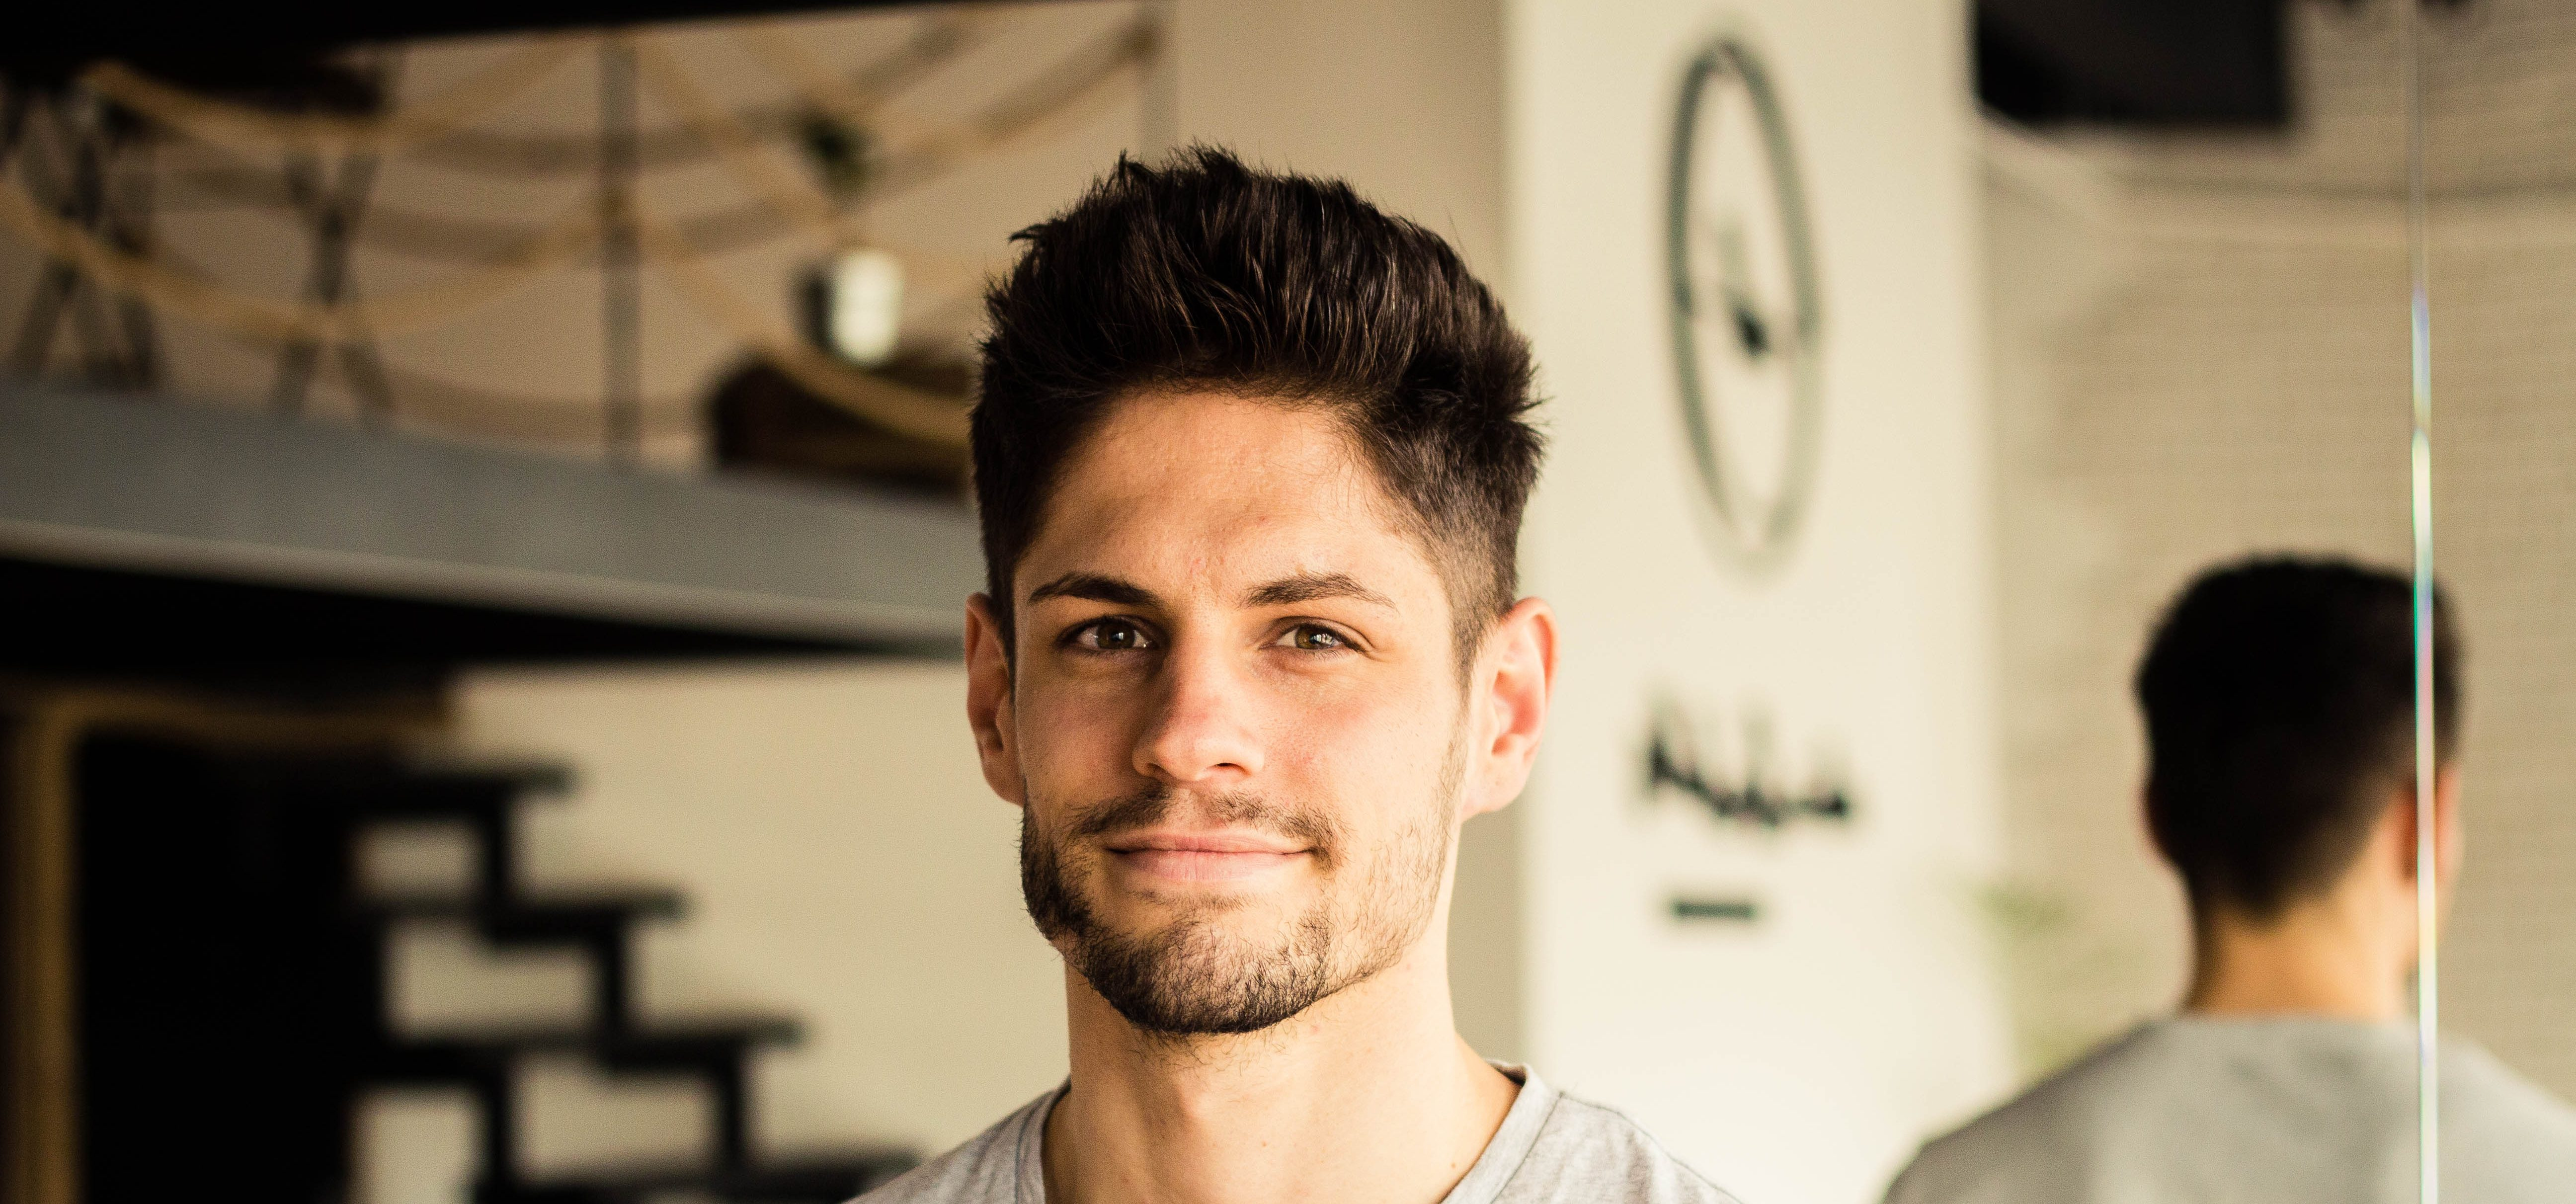 Adrian Bartalos